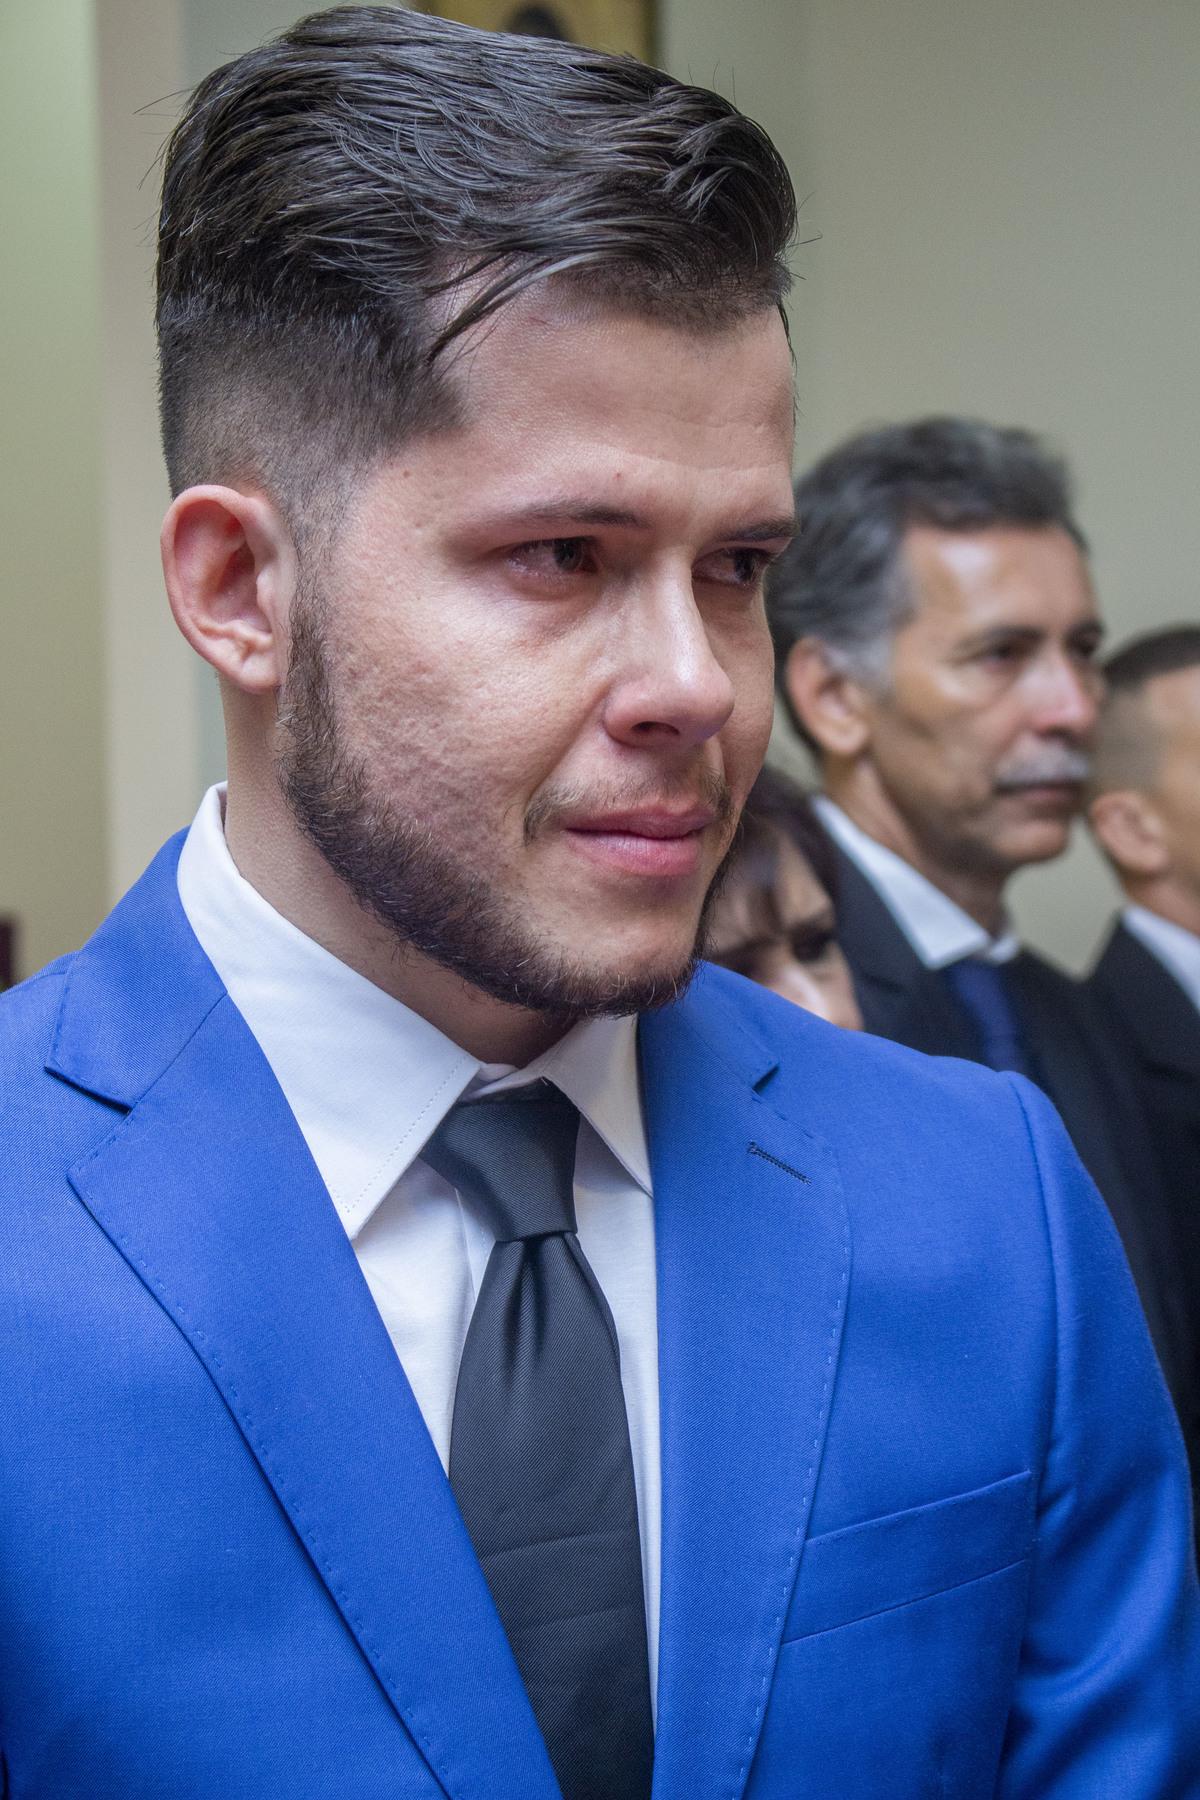 Noivo chora ao ver a noiva entrar na cerimonia de casamento